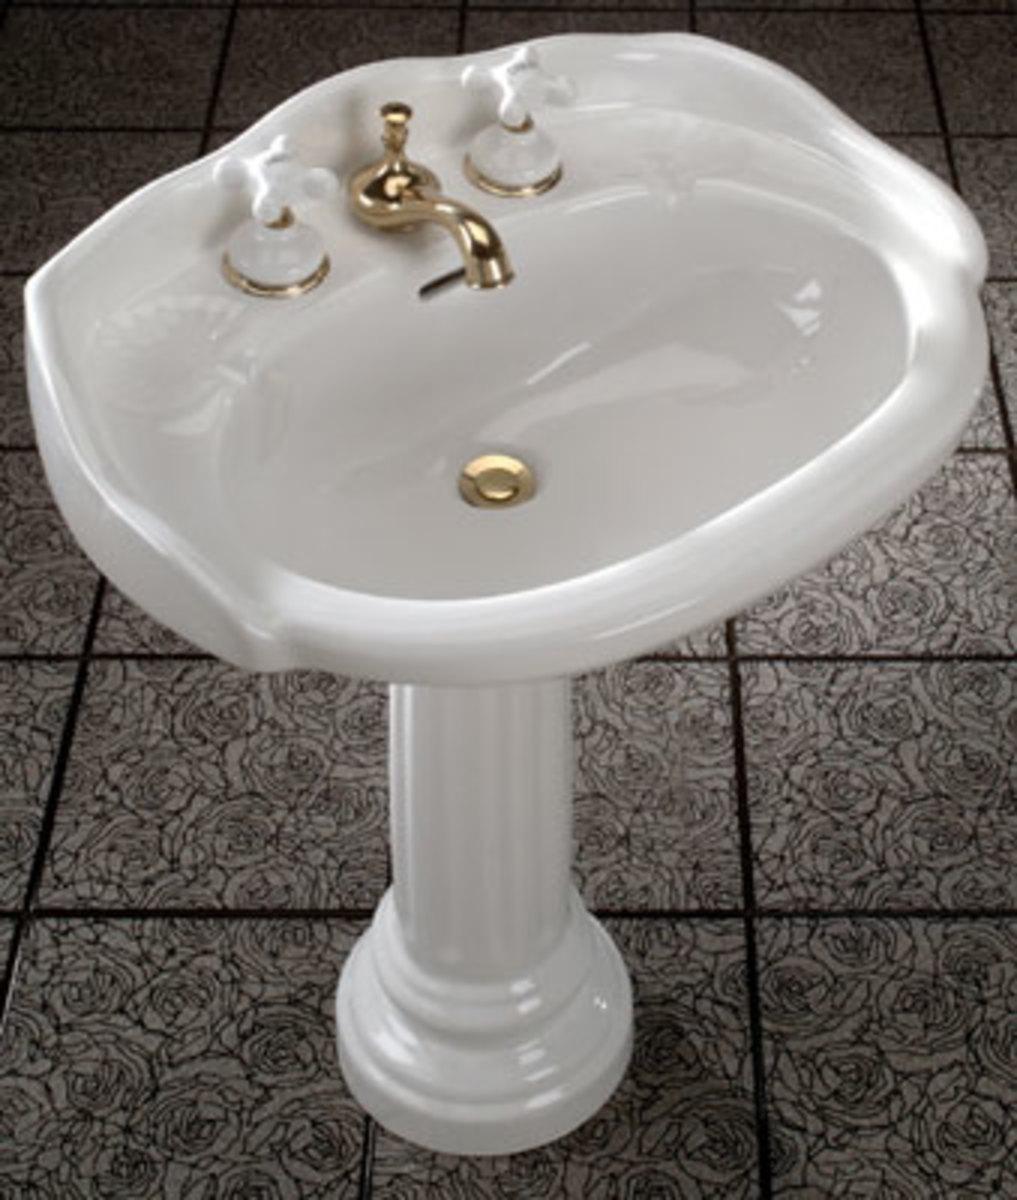 Mod request furniture build sims 4 studio Installing a pedestal bathroom sink